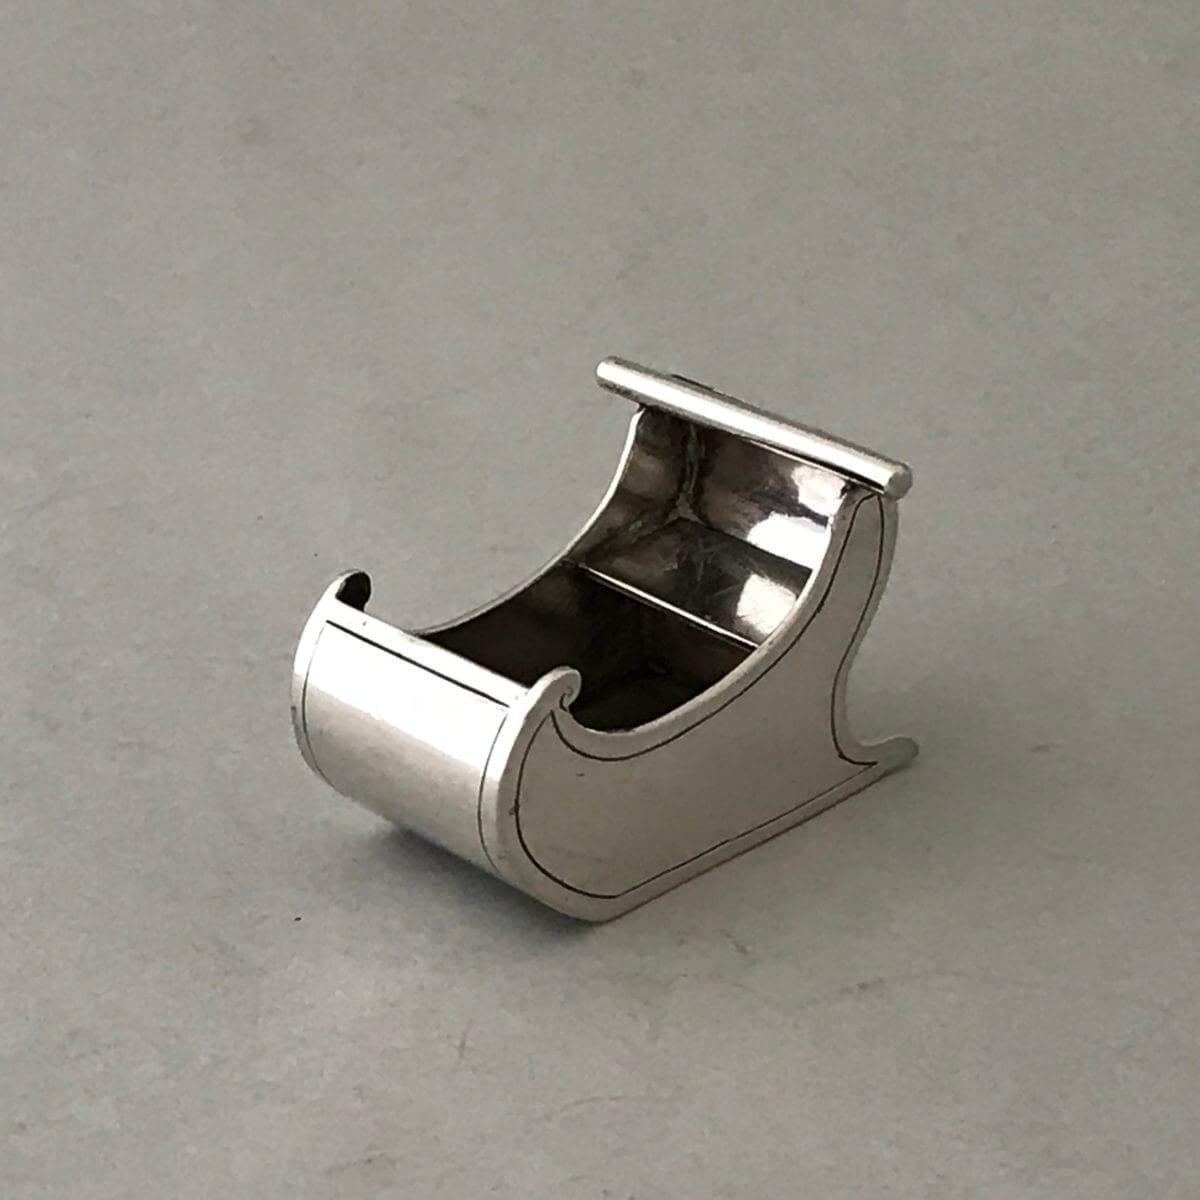 IMG 0020 1200x1200 - Miniatuur slee (verkocht)